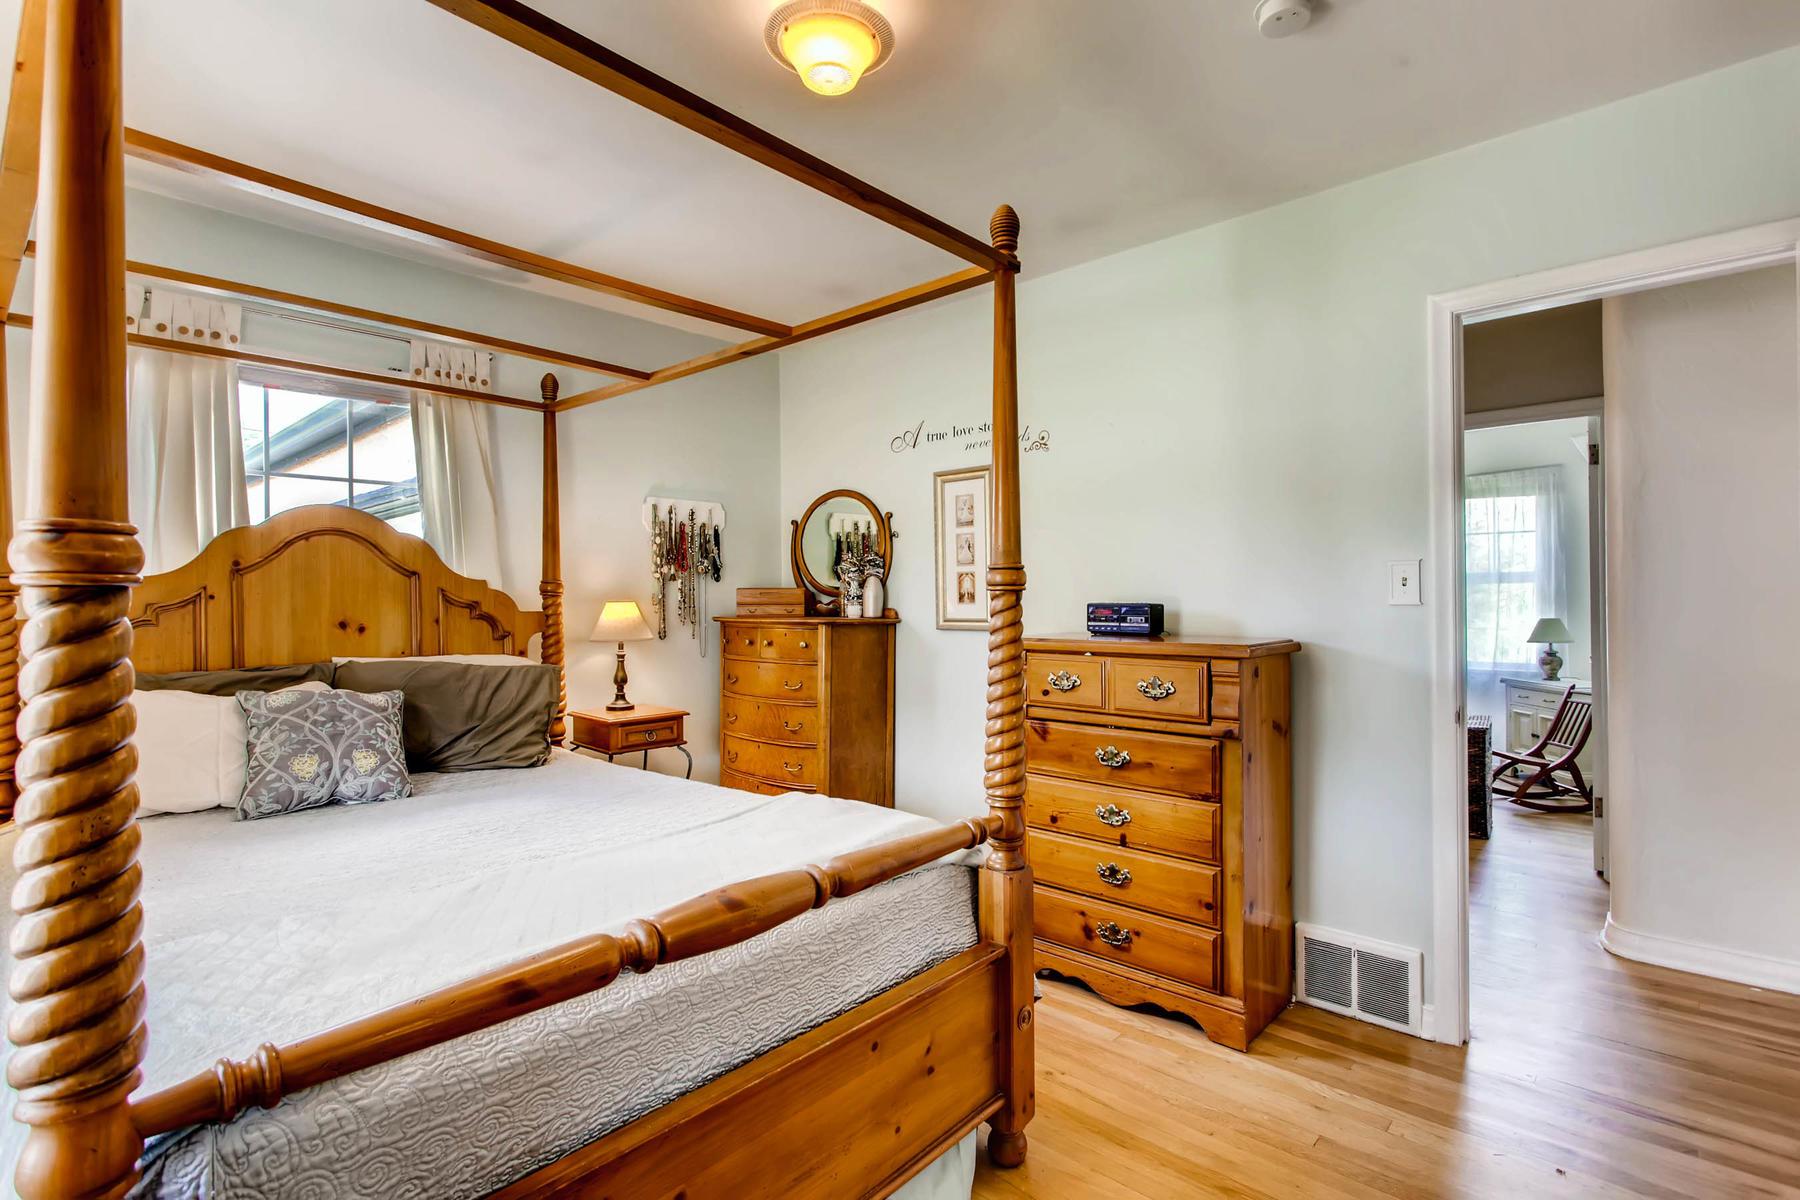 1737 W Powers Ave Littleton CO-MLS_Size-012-14-Master Bedroom-1800x1200-72dpi.jpg